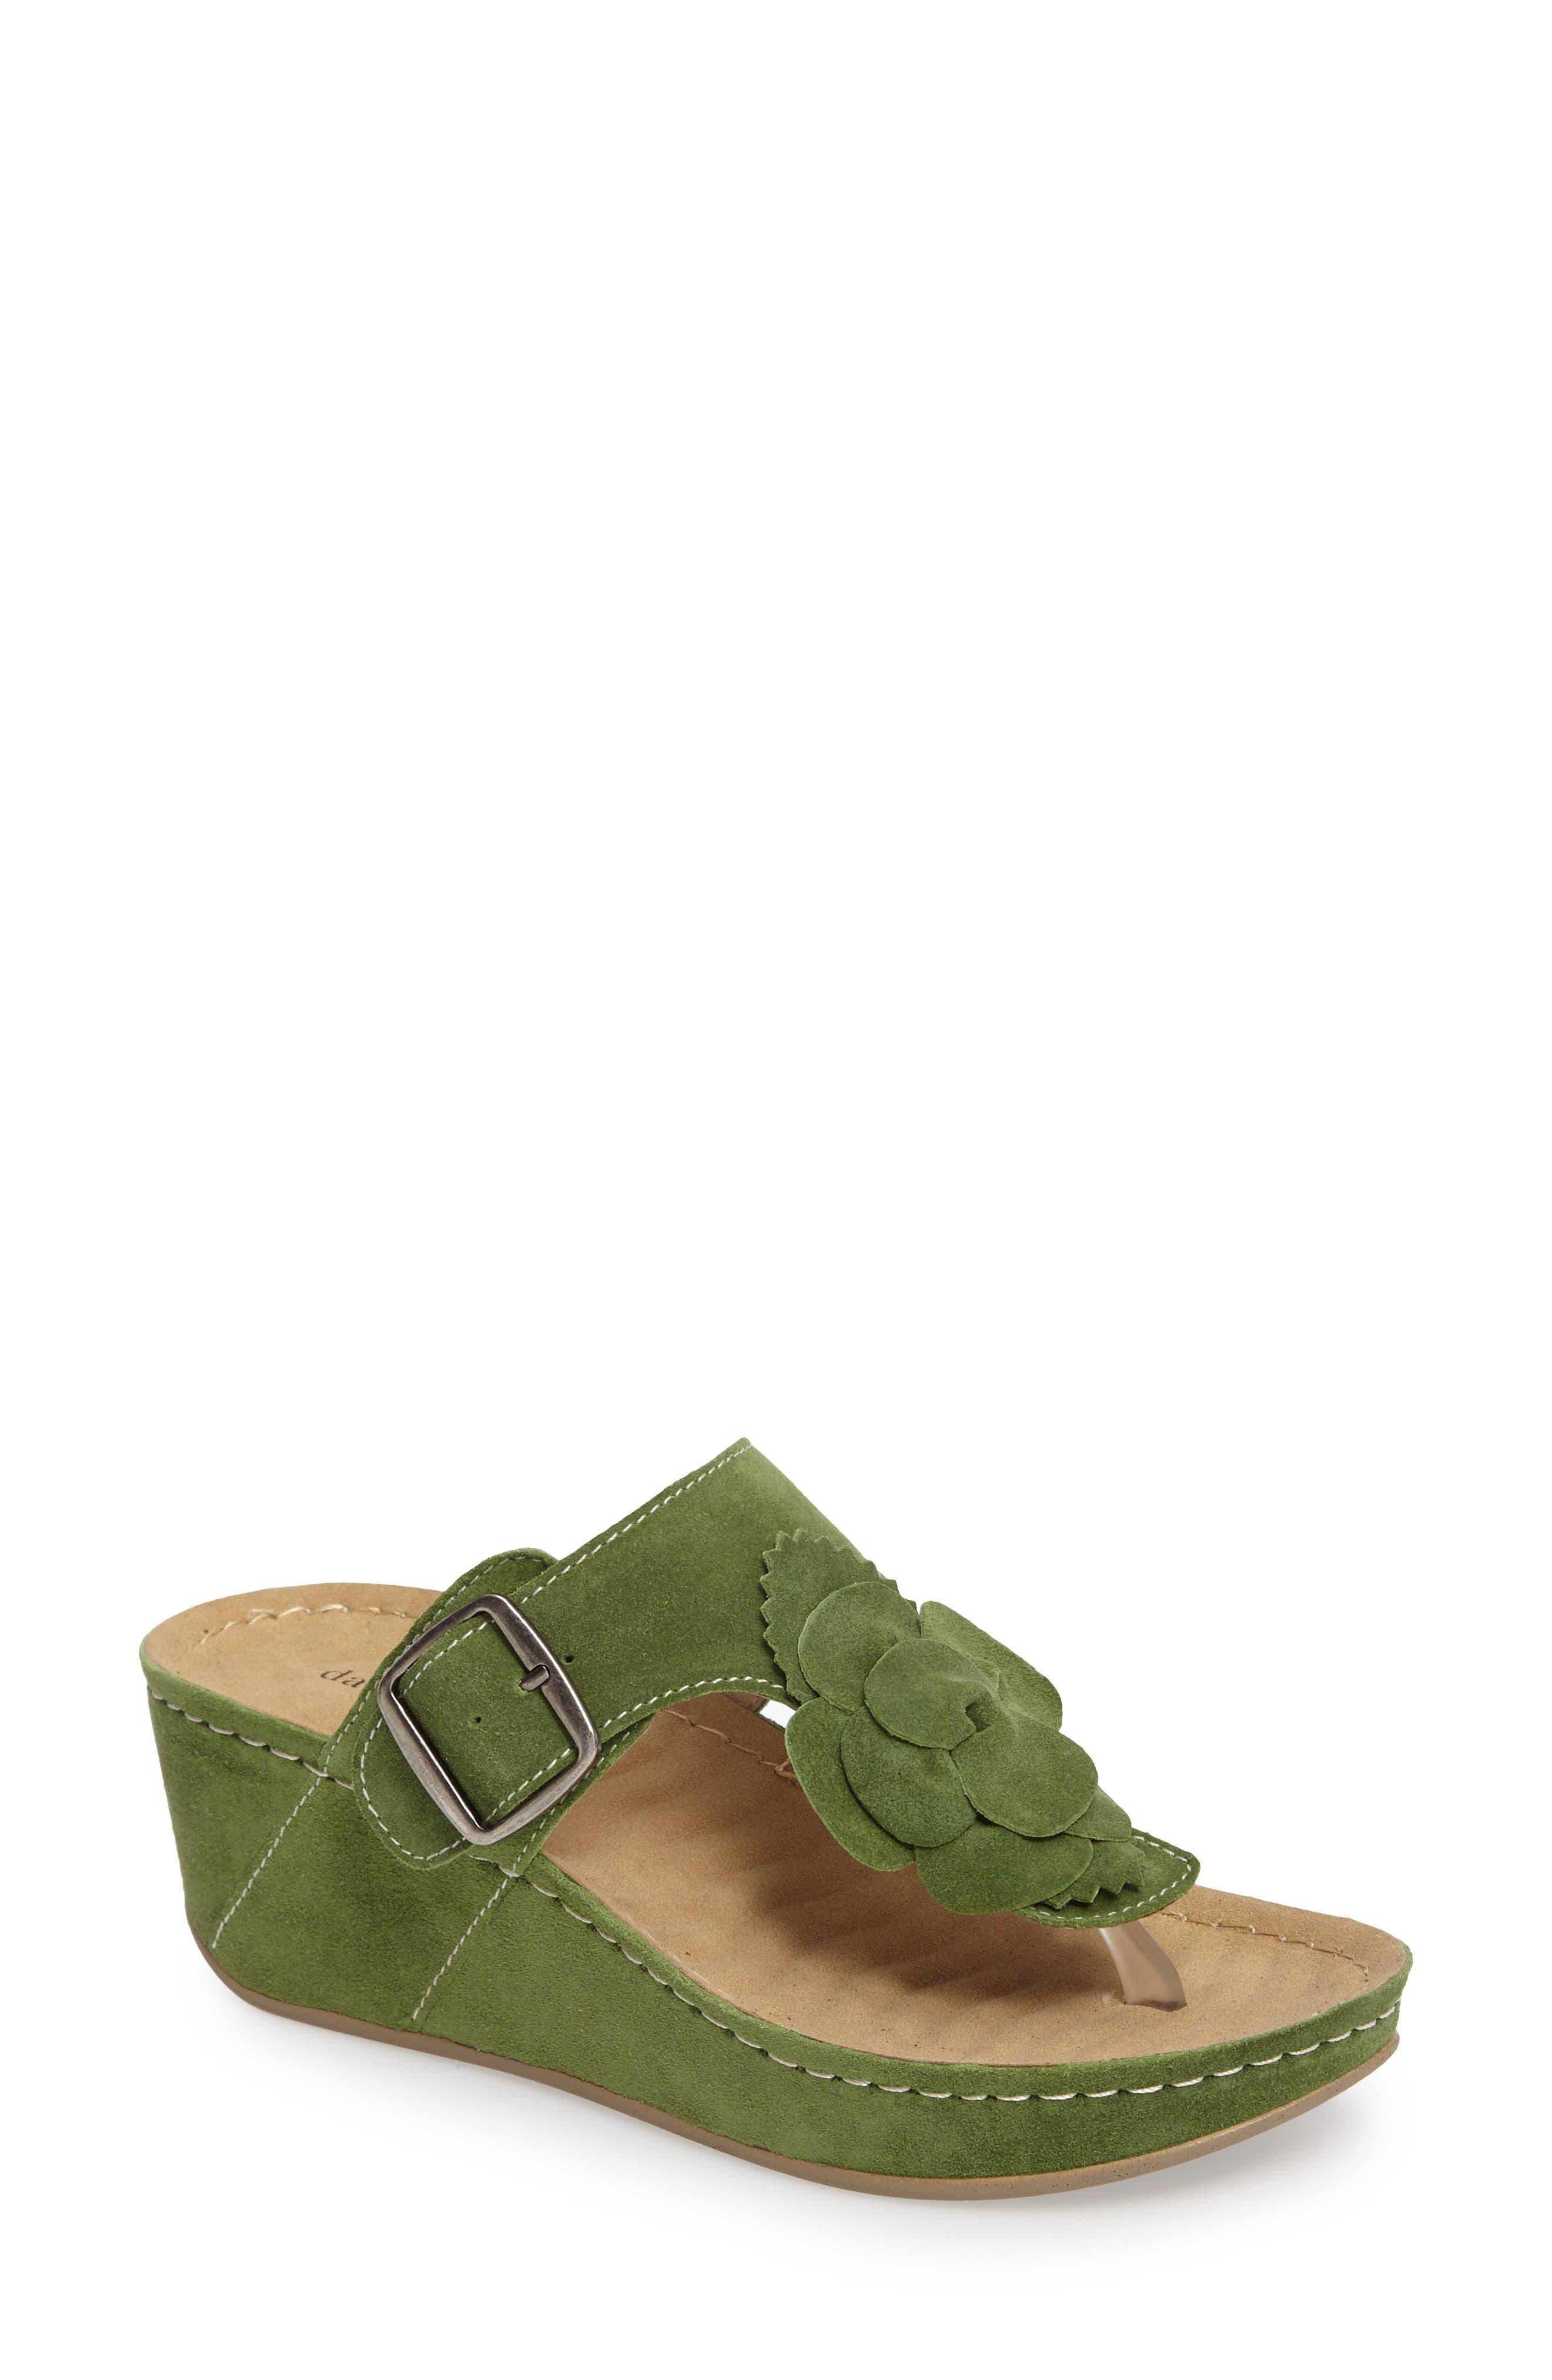 Spring Platform Wedge Sandal,                             Main thumbnail 1, color,                             Green Suede